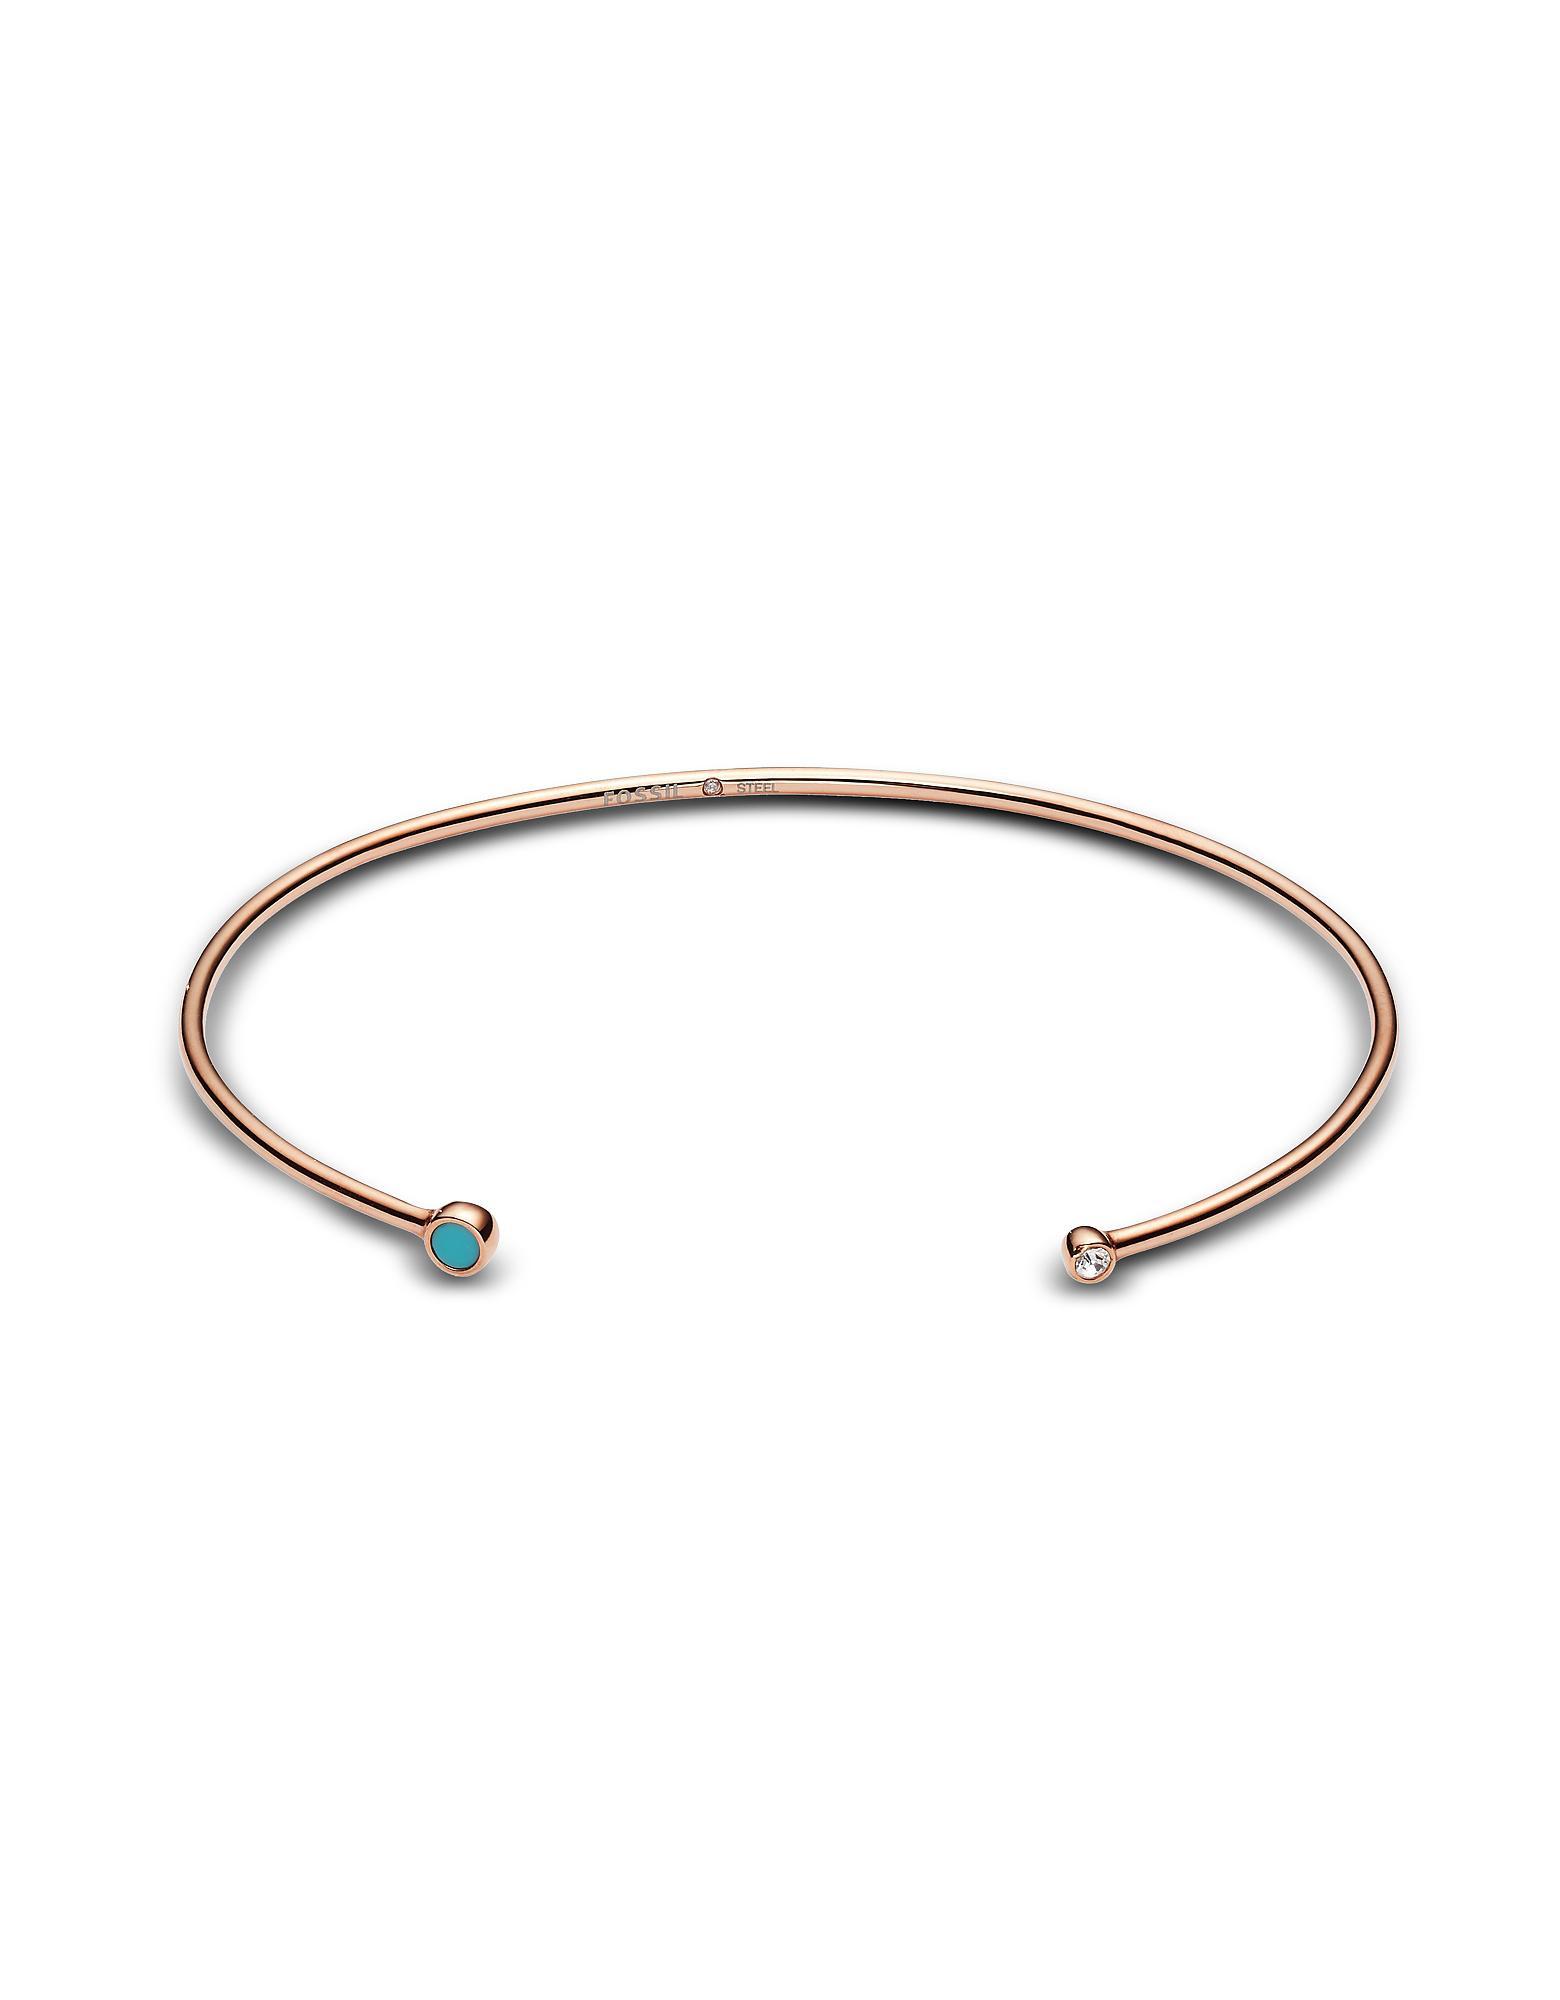 Fossil Women's Bracelet JF02641791 e4eXr